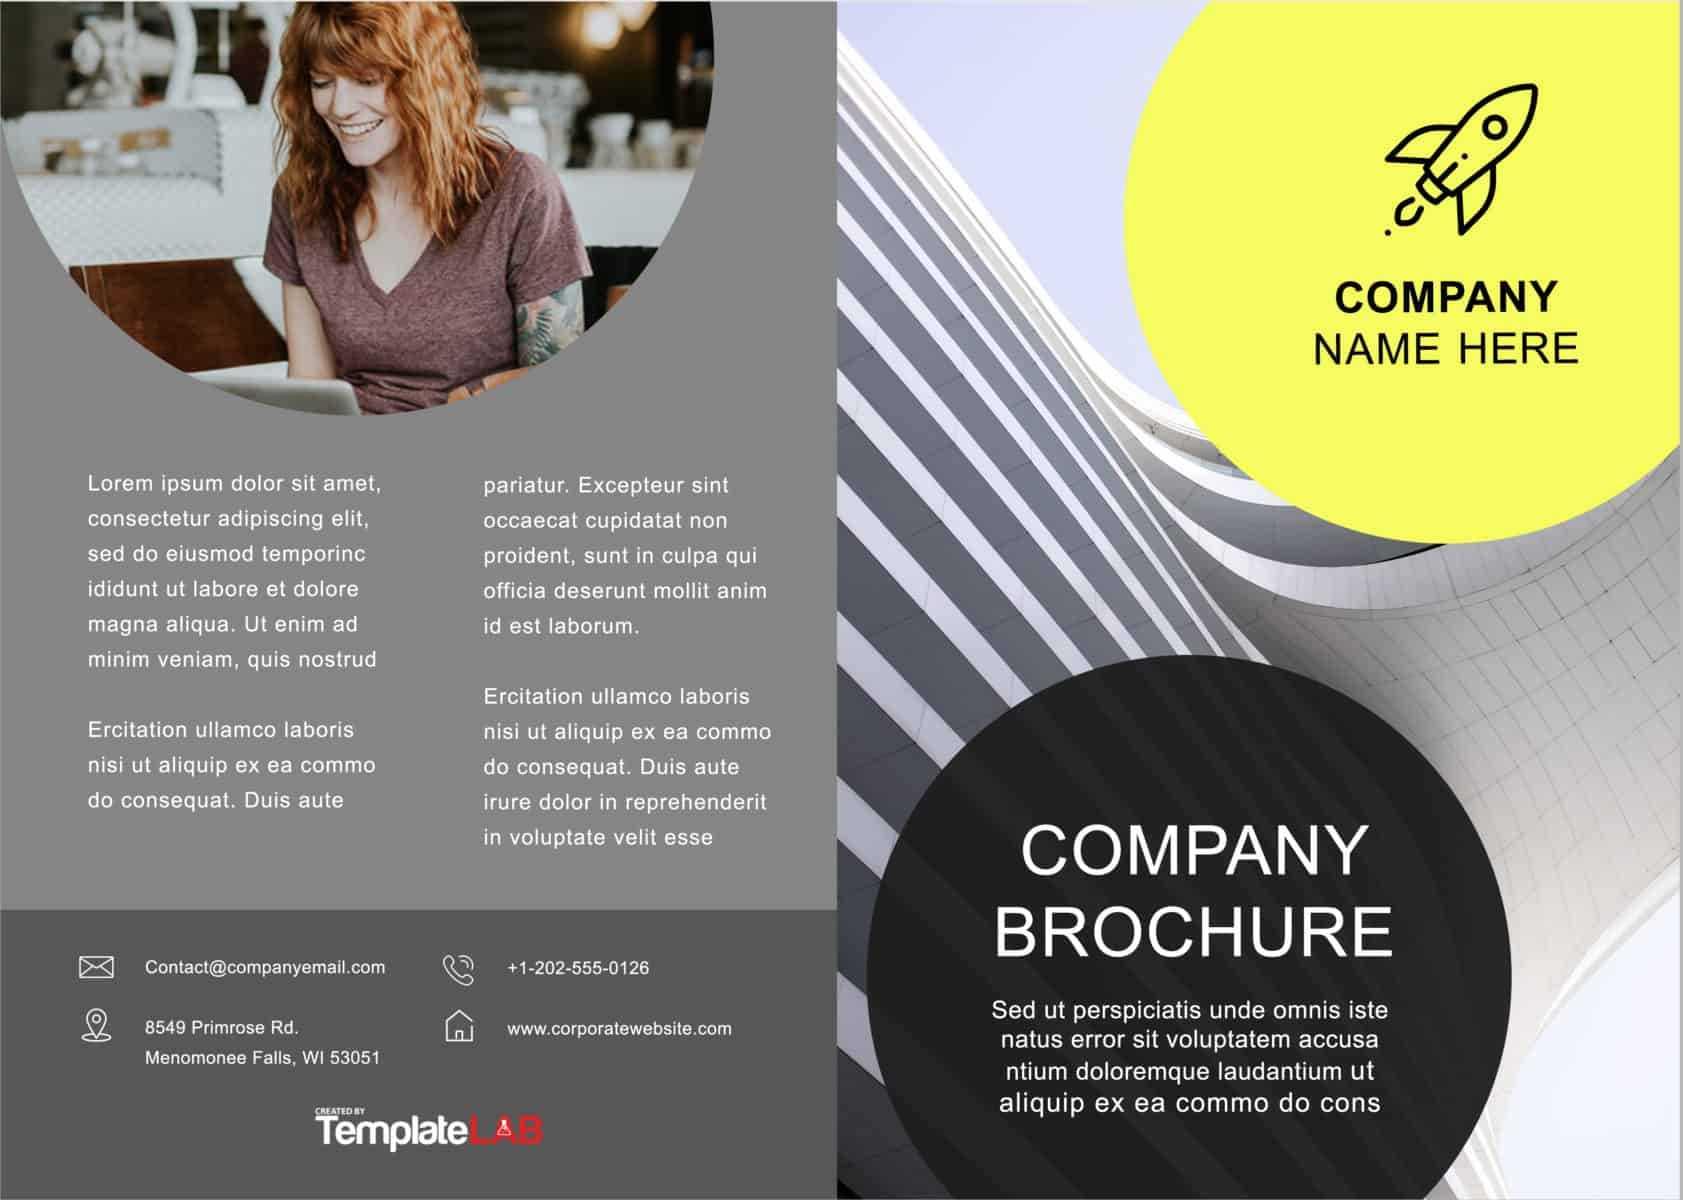 33 Free Brochure Templates (Word + Pdf) ᐅ Templatelab For Free Brochure Templates For Word 2010